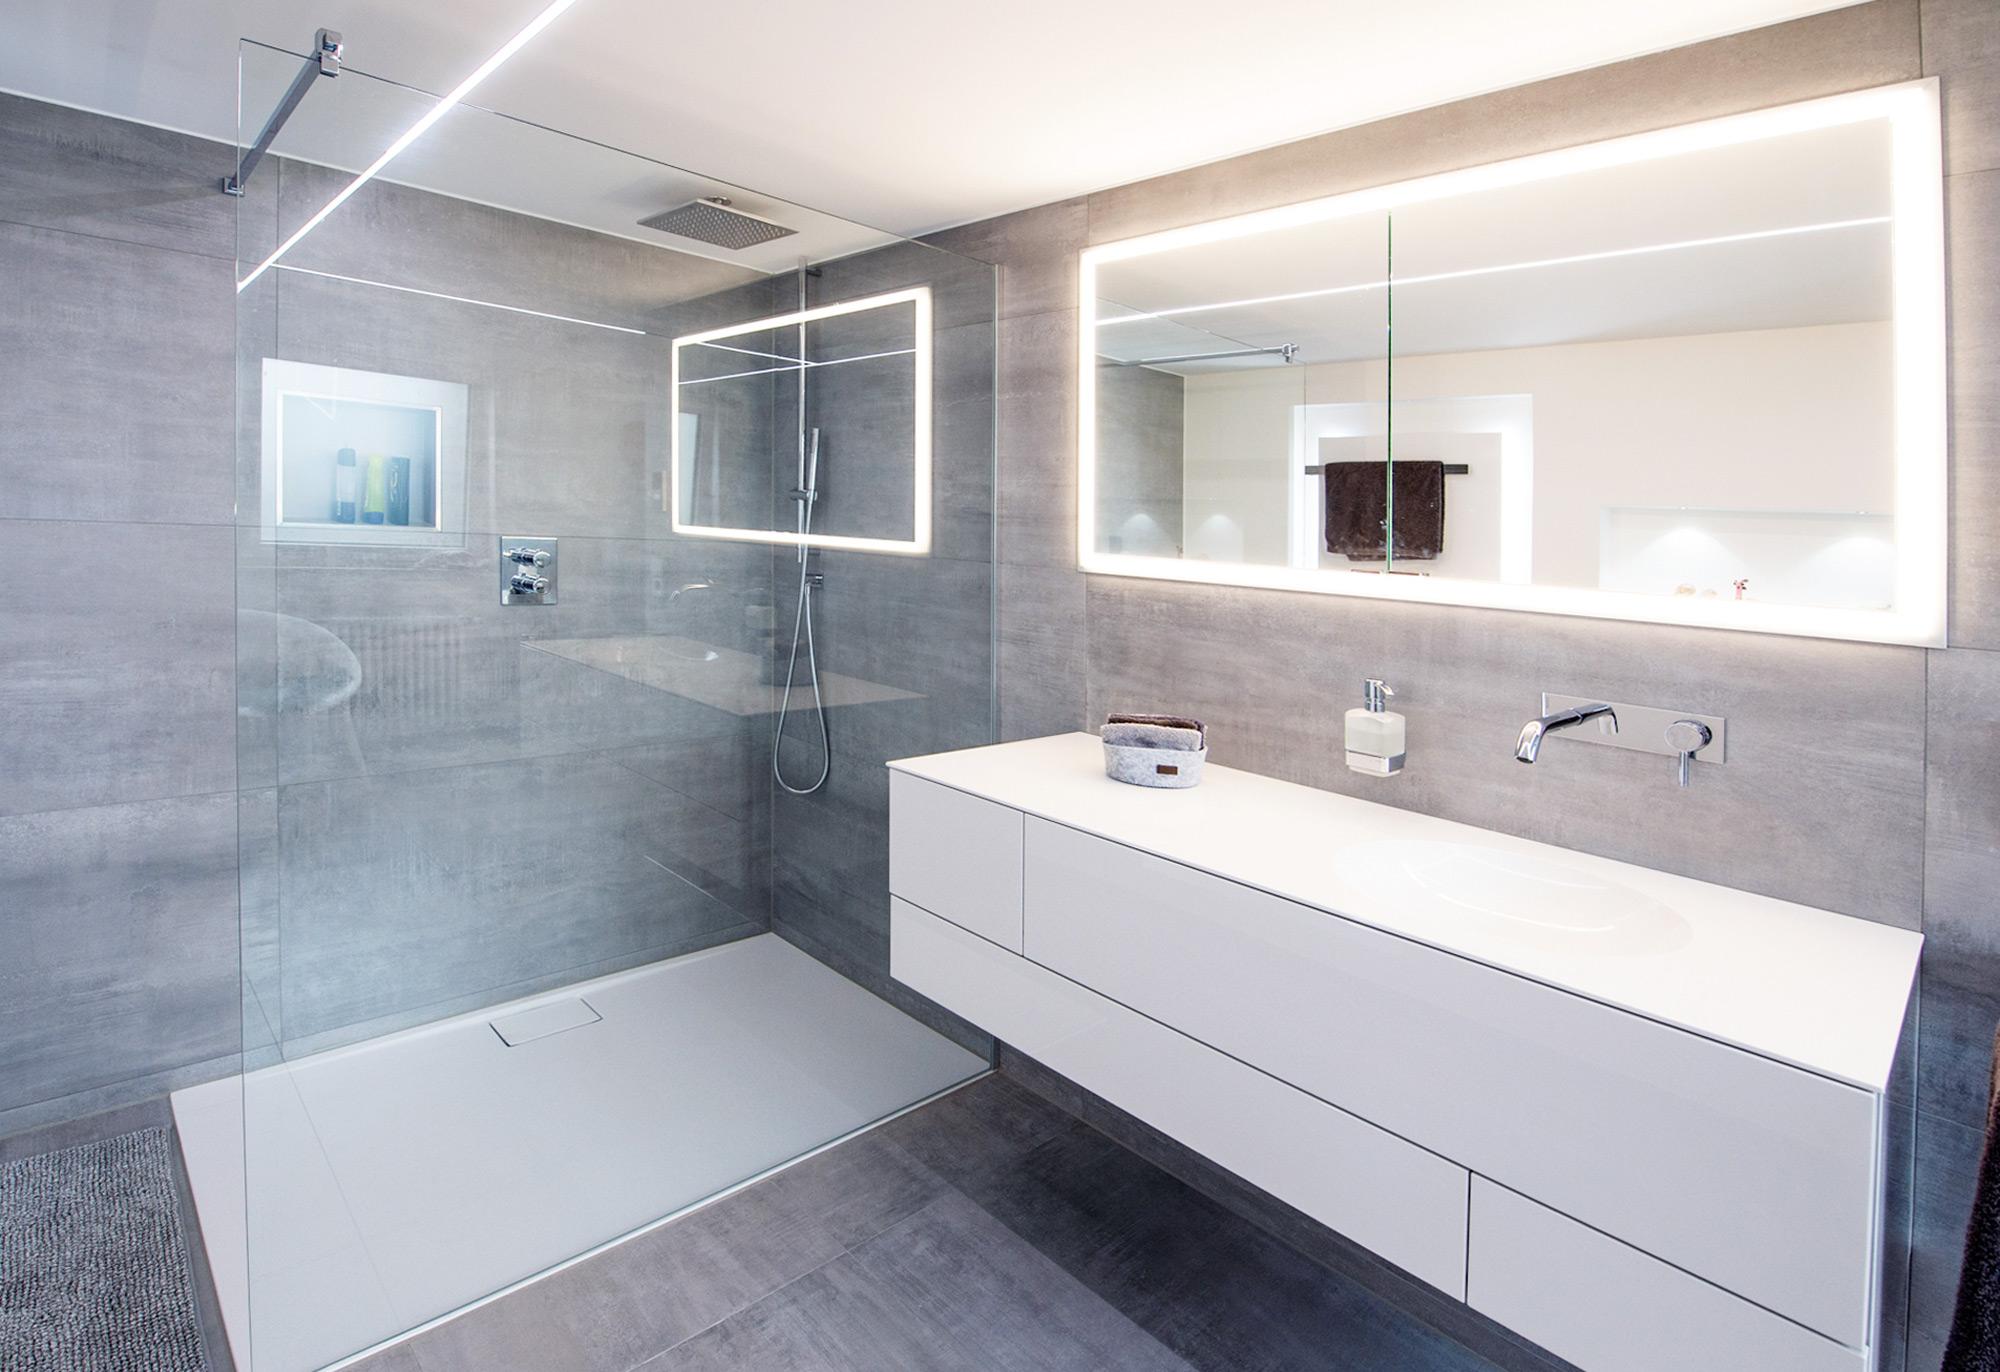 Ihr Fachmann Fur Sanitar Badplanung Badsanierung In Stuttgart Raff Sanitar Gmbh